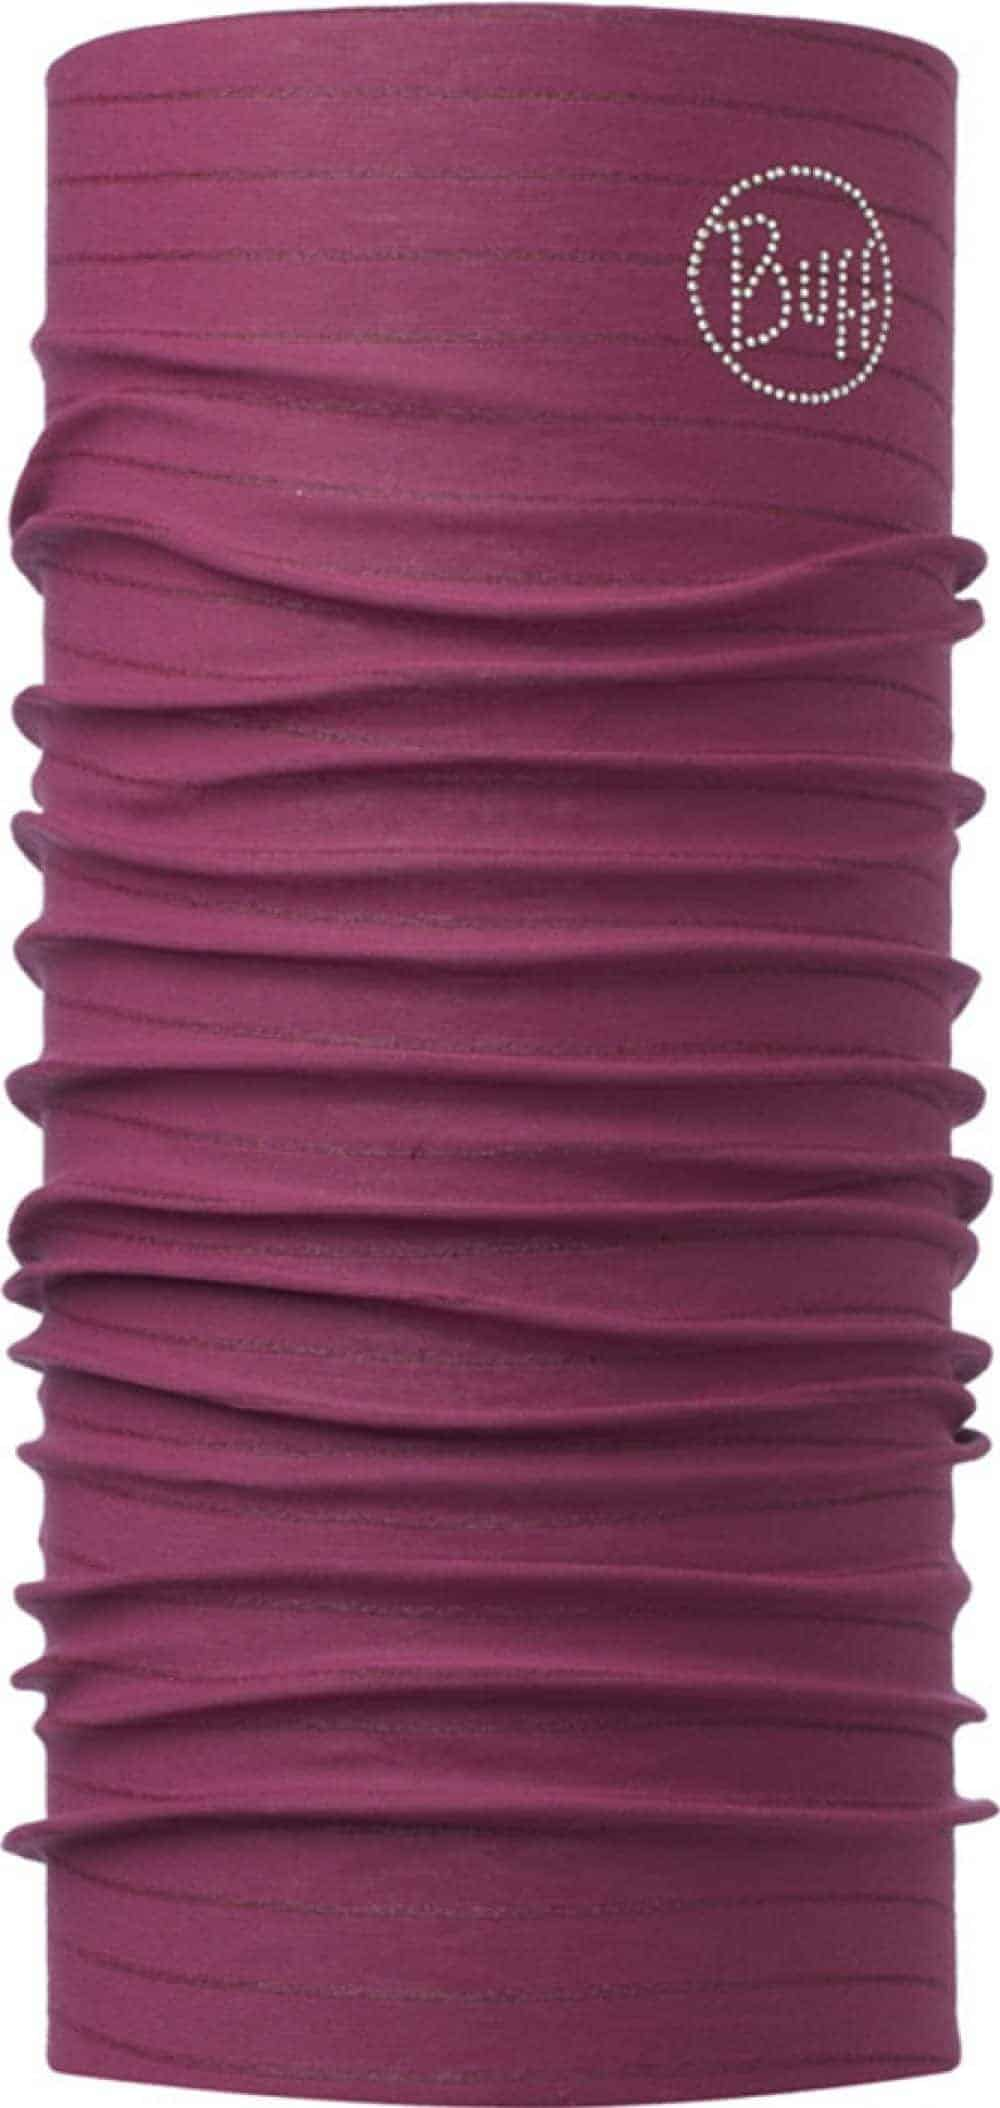 "Studio photo of the Original Buff® design ""Amaranth Purple Chic"". Source: buff.eu"